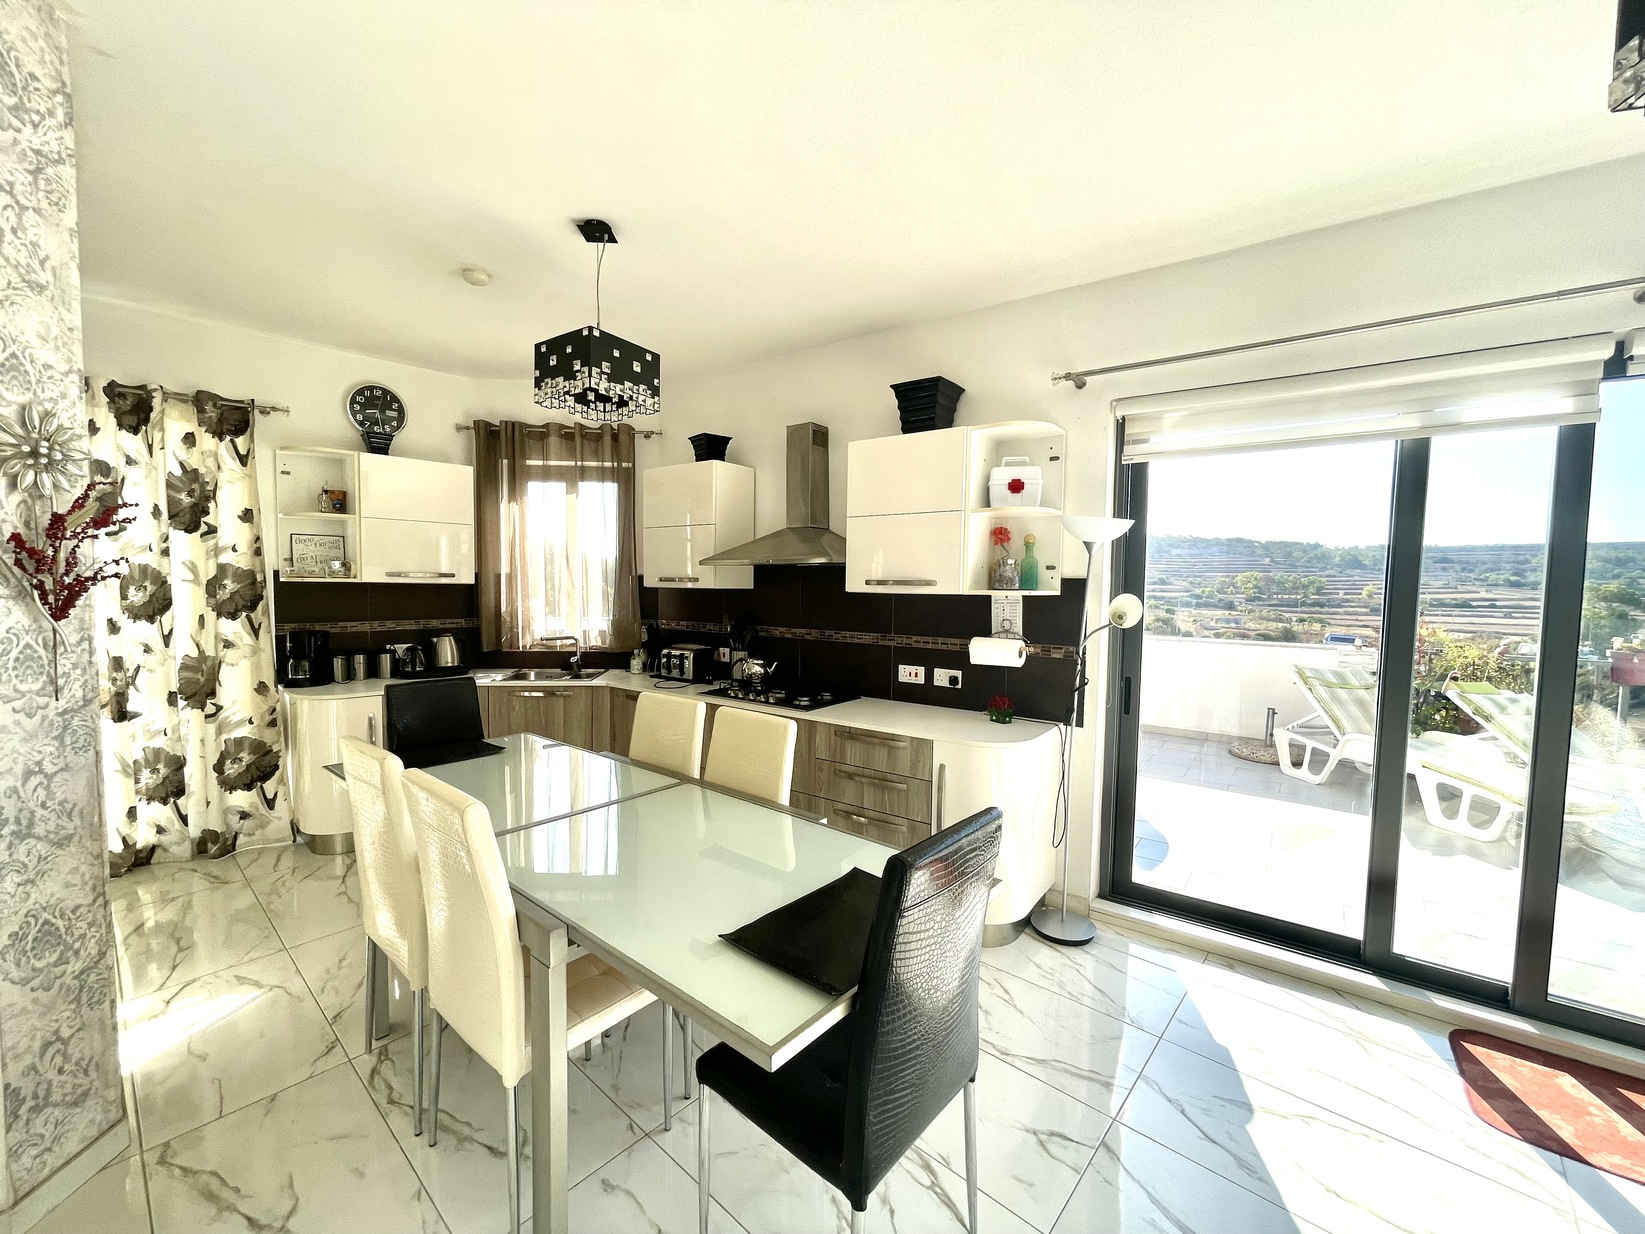 4 bed Penthouse For Rent in Marsaxlokk, Marsaxlokk - thumb 5